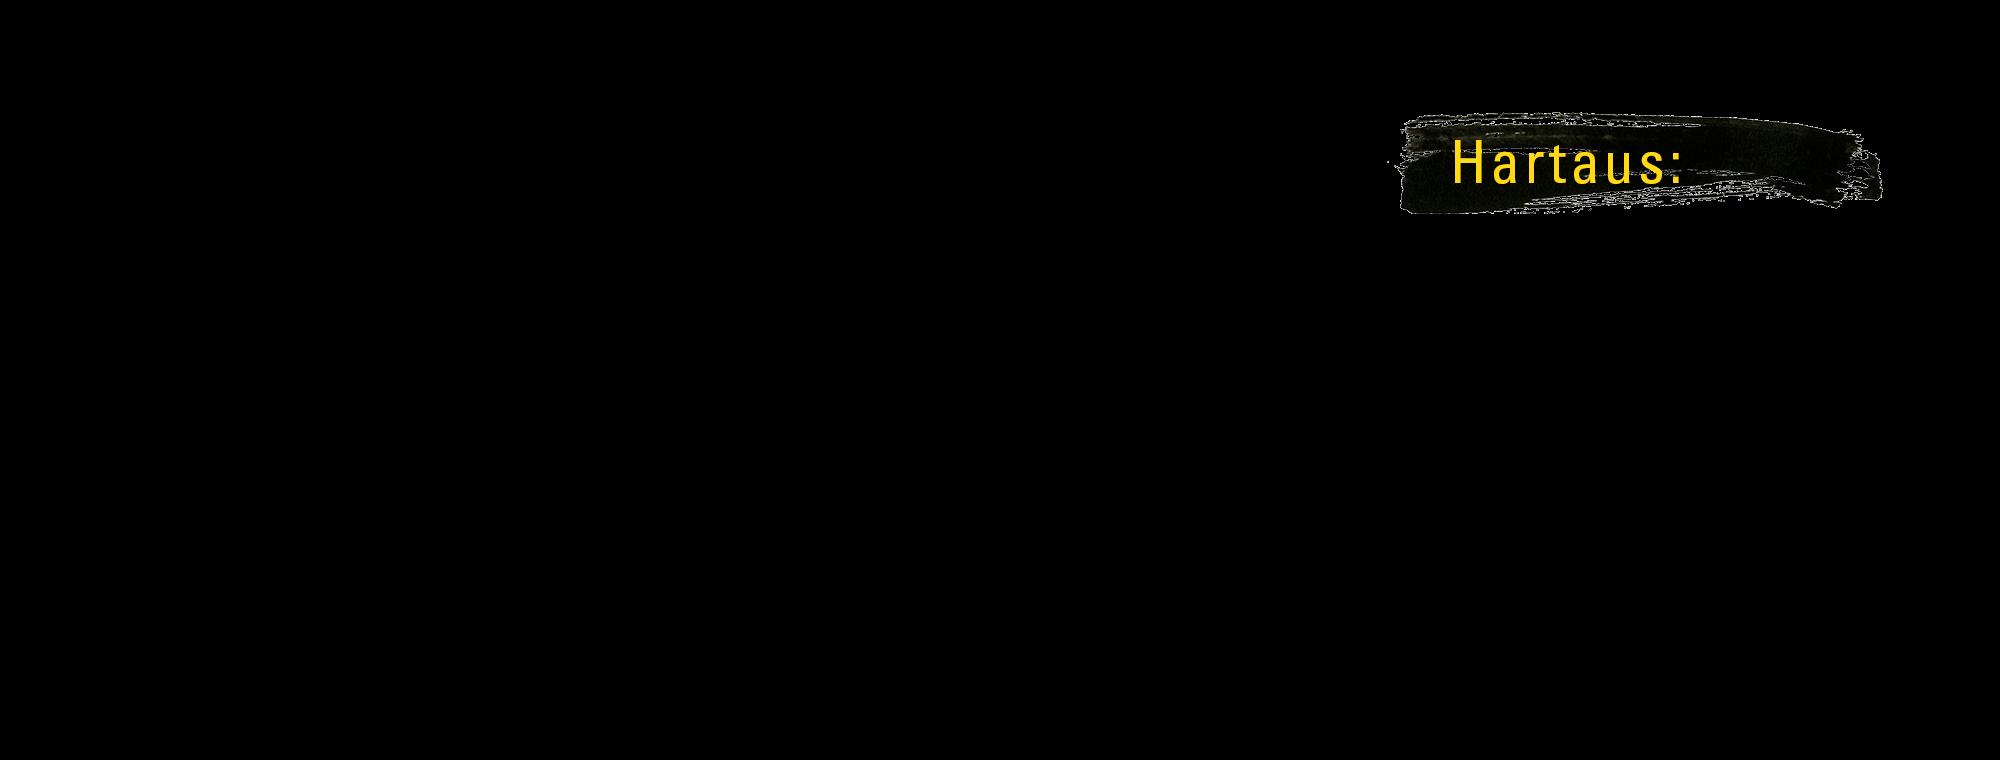 Helluntai